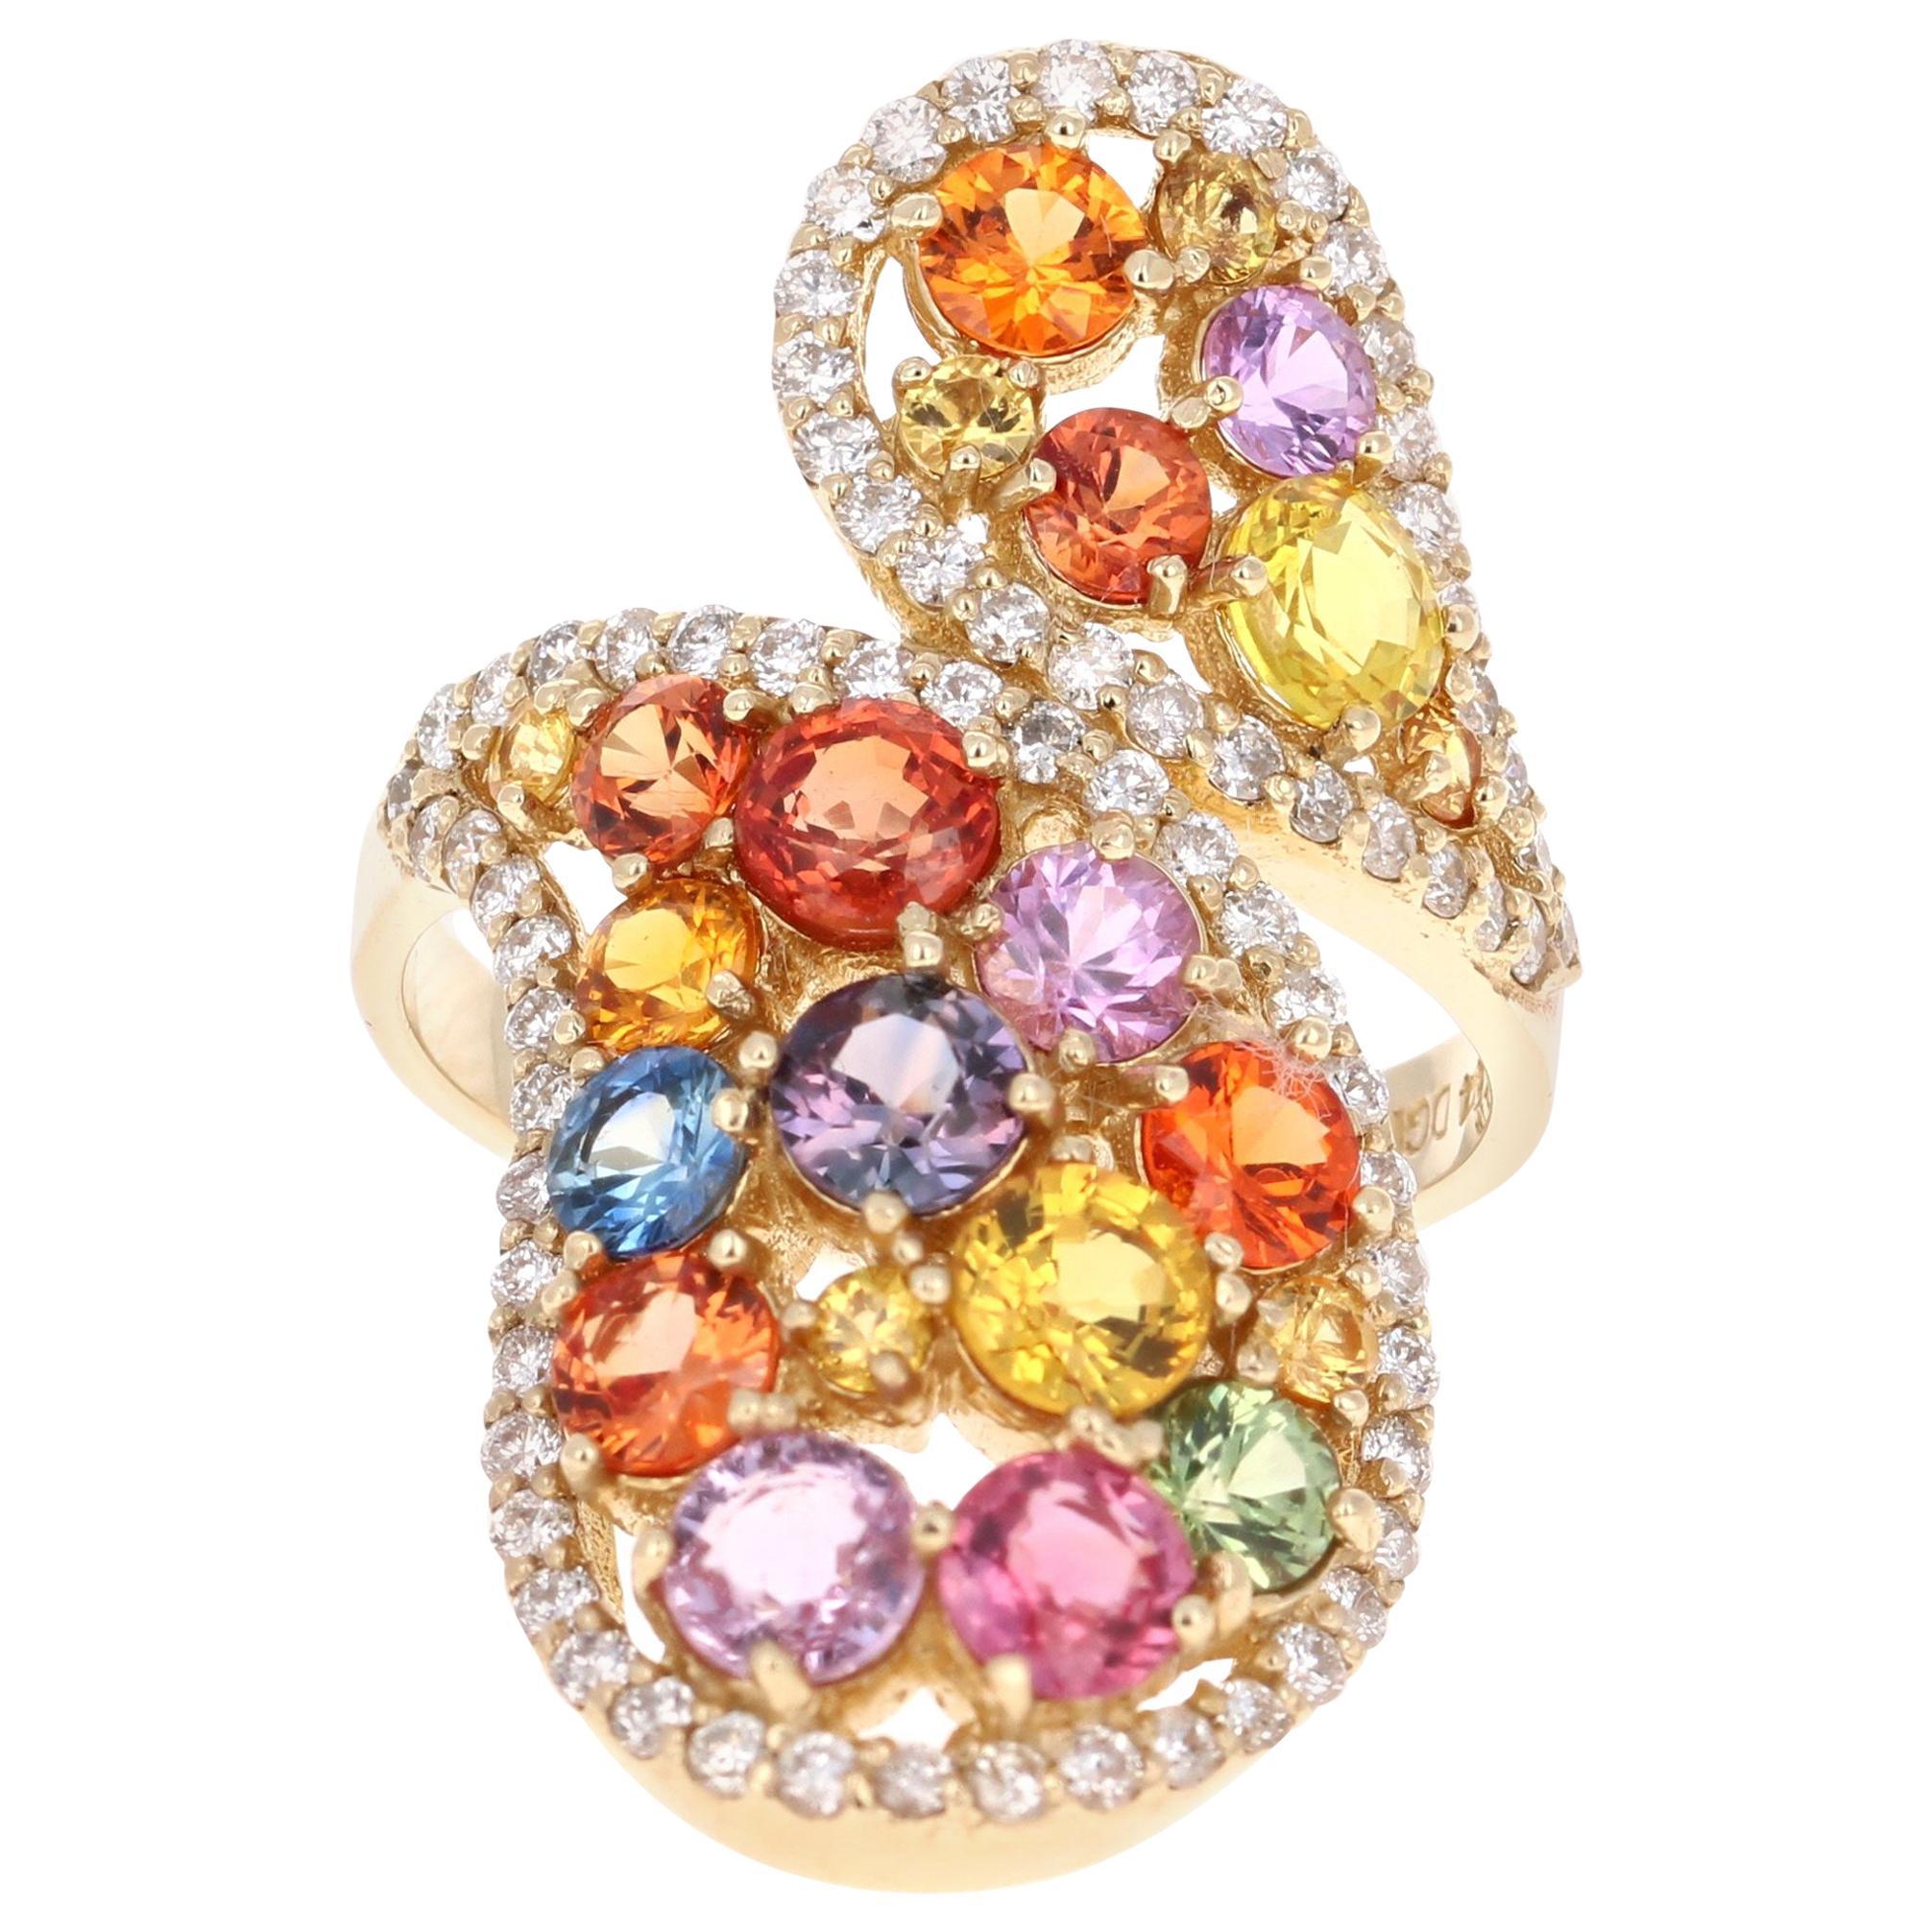 5.27 Carat Multicolored Sapphire Diamond 14 Karat Yellow Gold Cocktail Ring